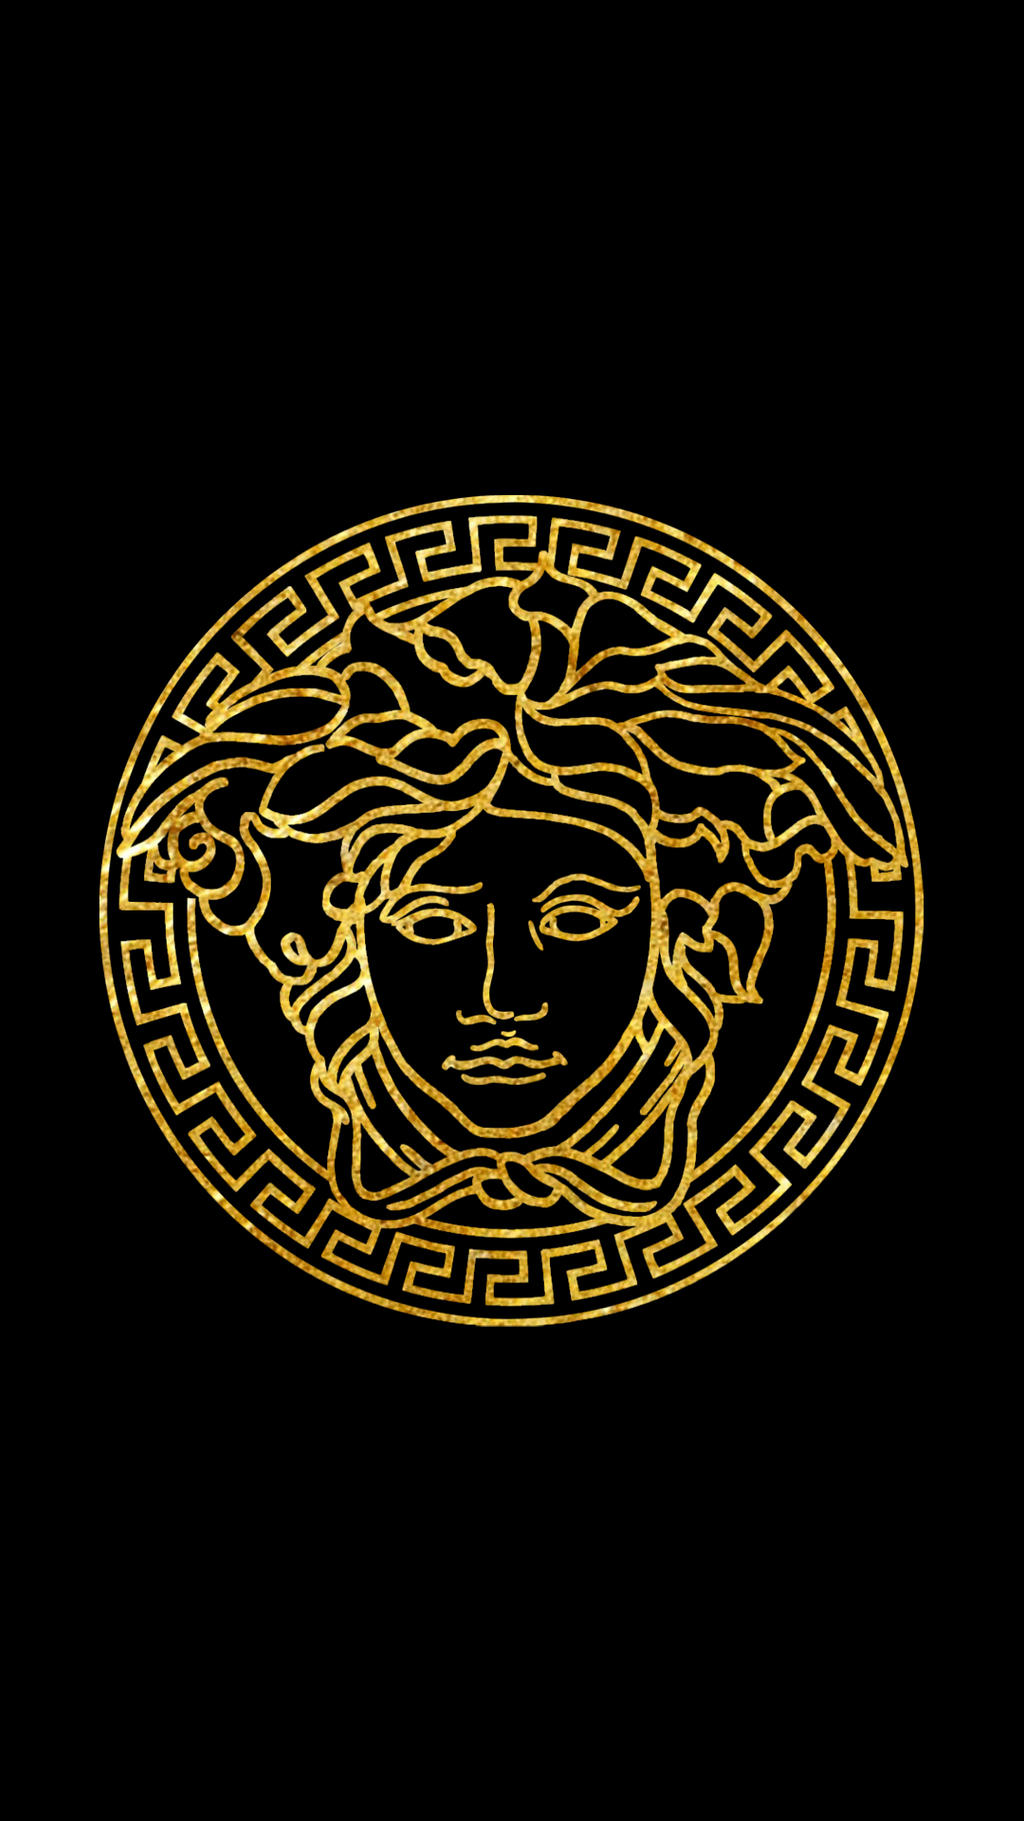 Versace Logo (Black) 1080x by tdotwallpapers on DeviantArt